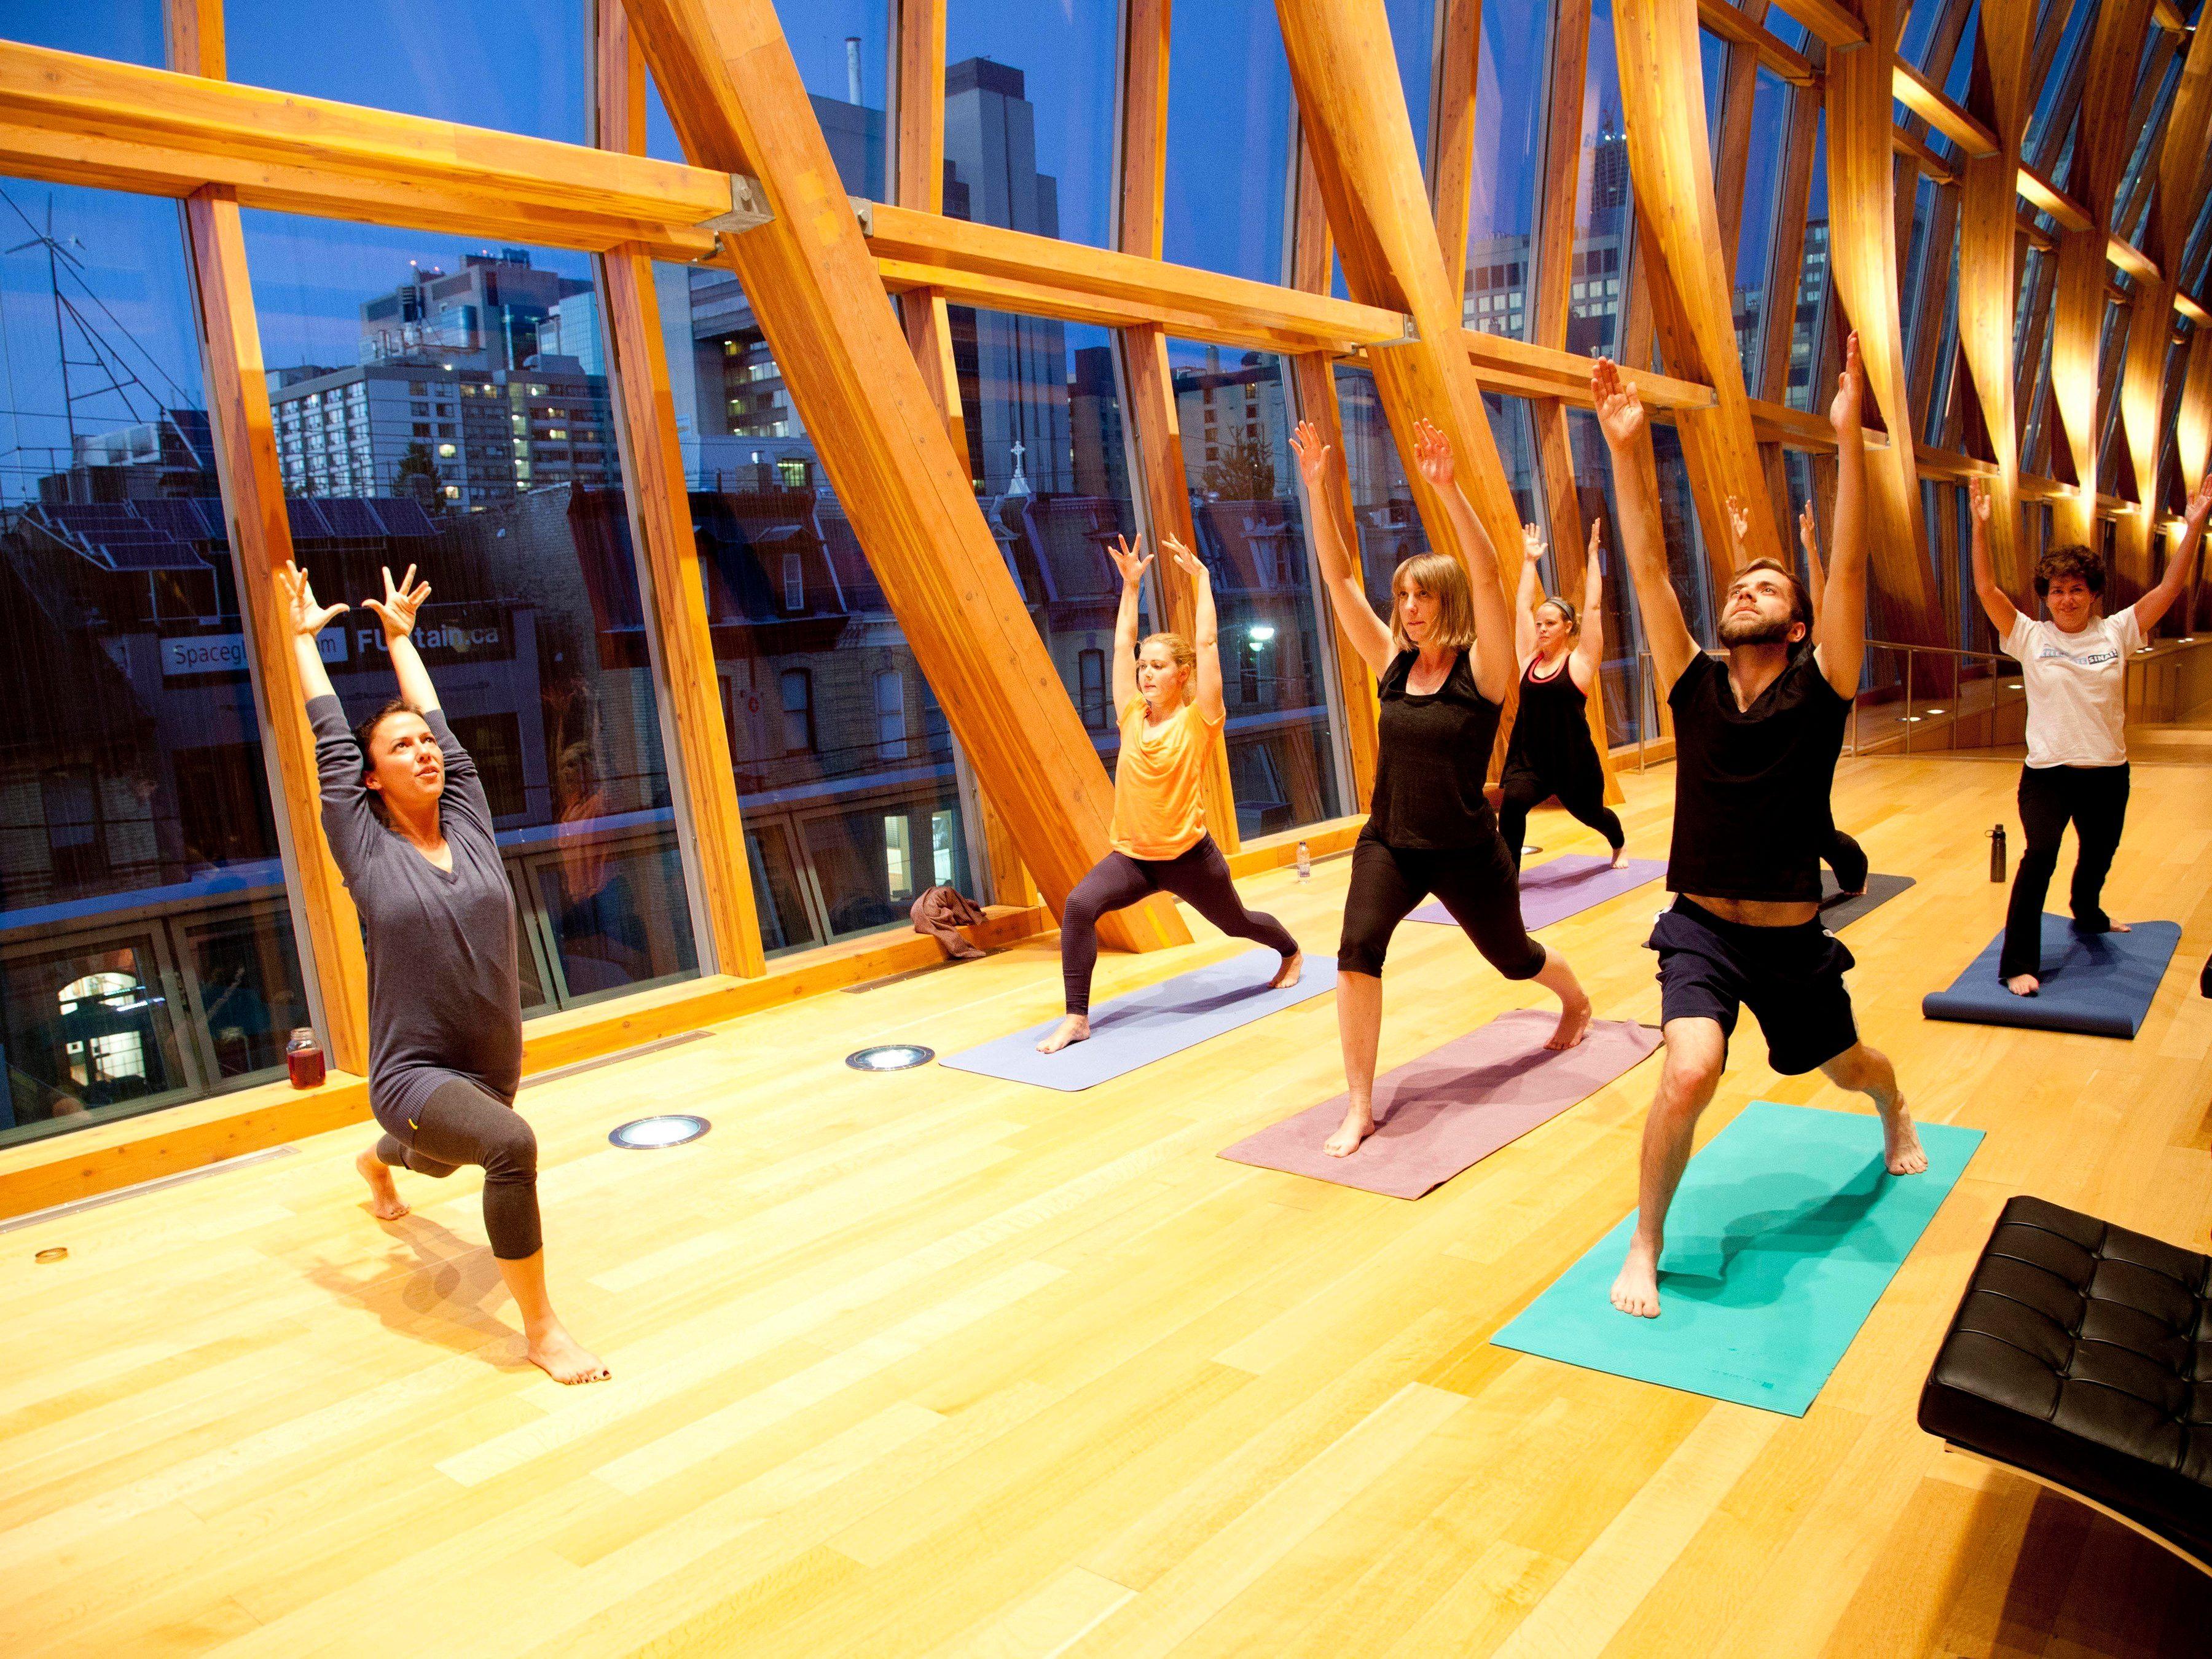 42. Yoga at the AGO